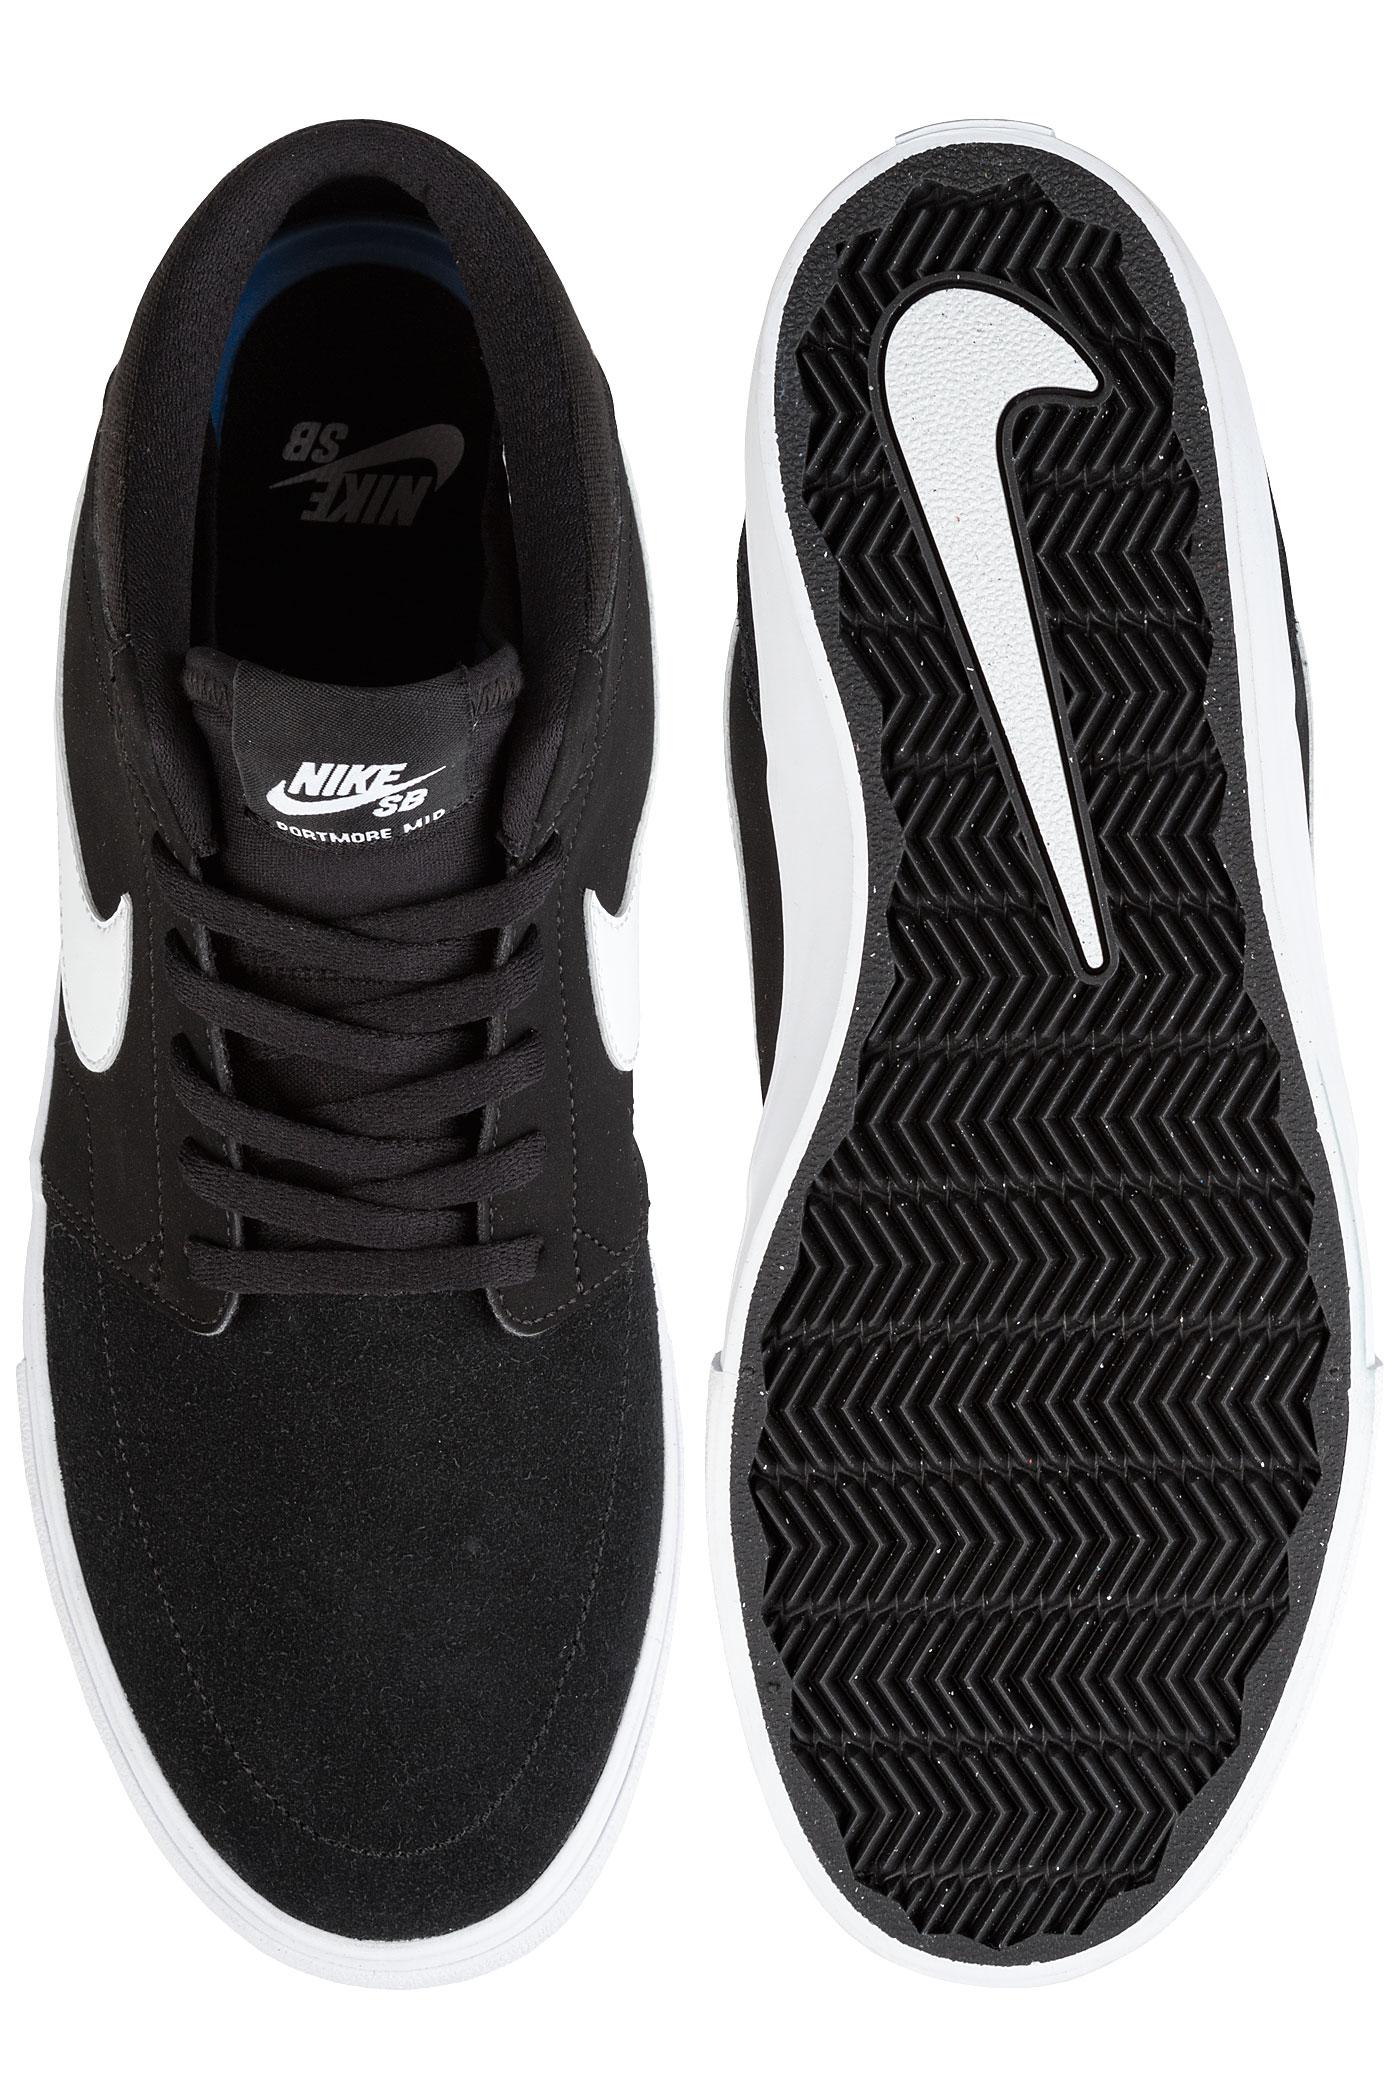 Mid Sb Nike White Solarsoft Portmore Ii Chaussureblack n0wP8kXNO